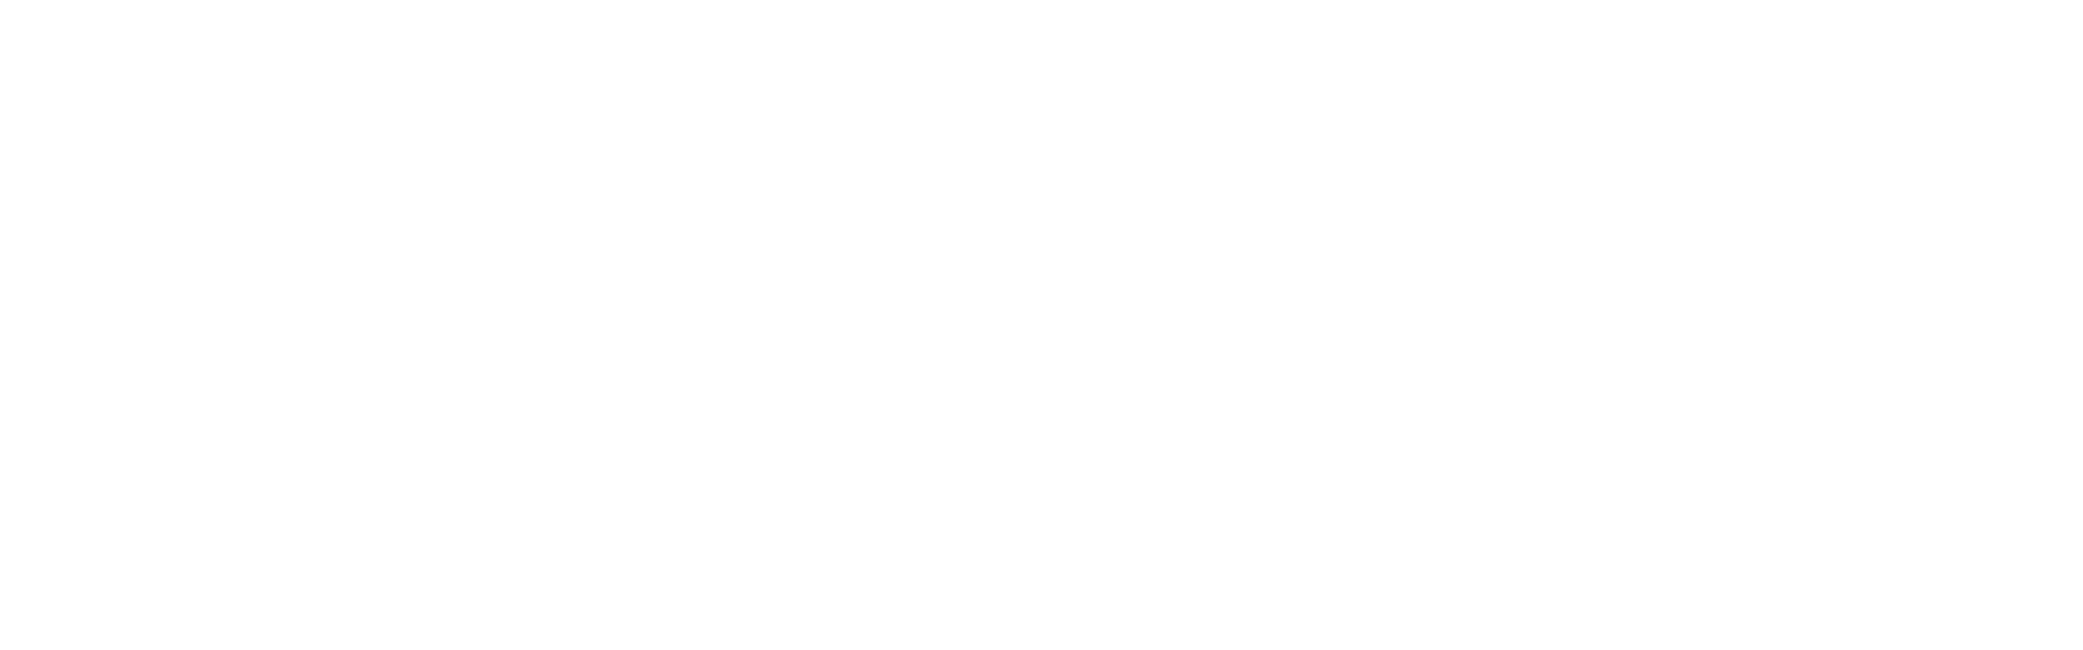 iswalac-logo